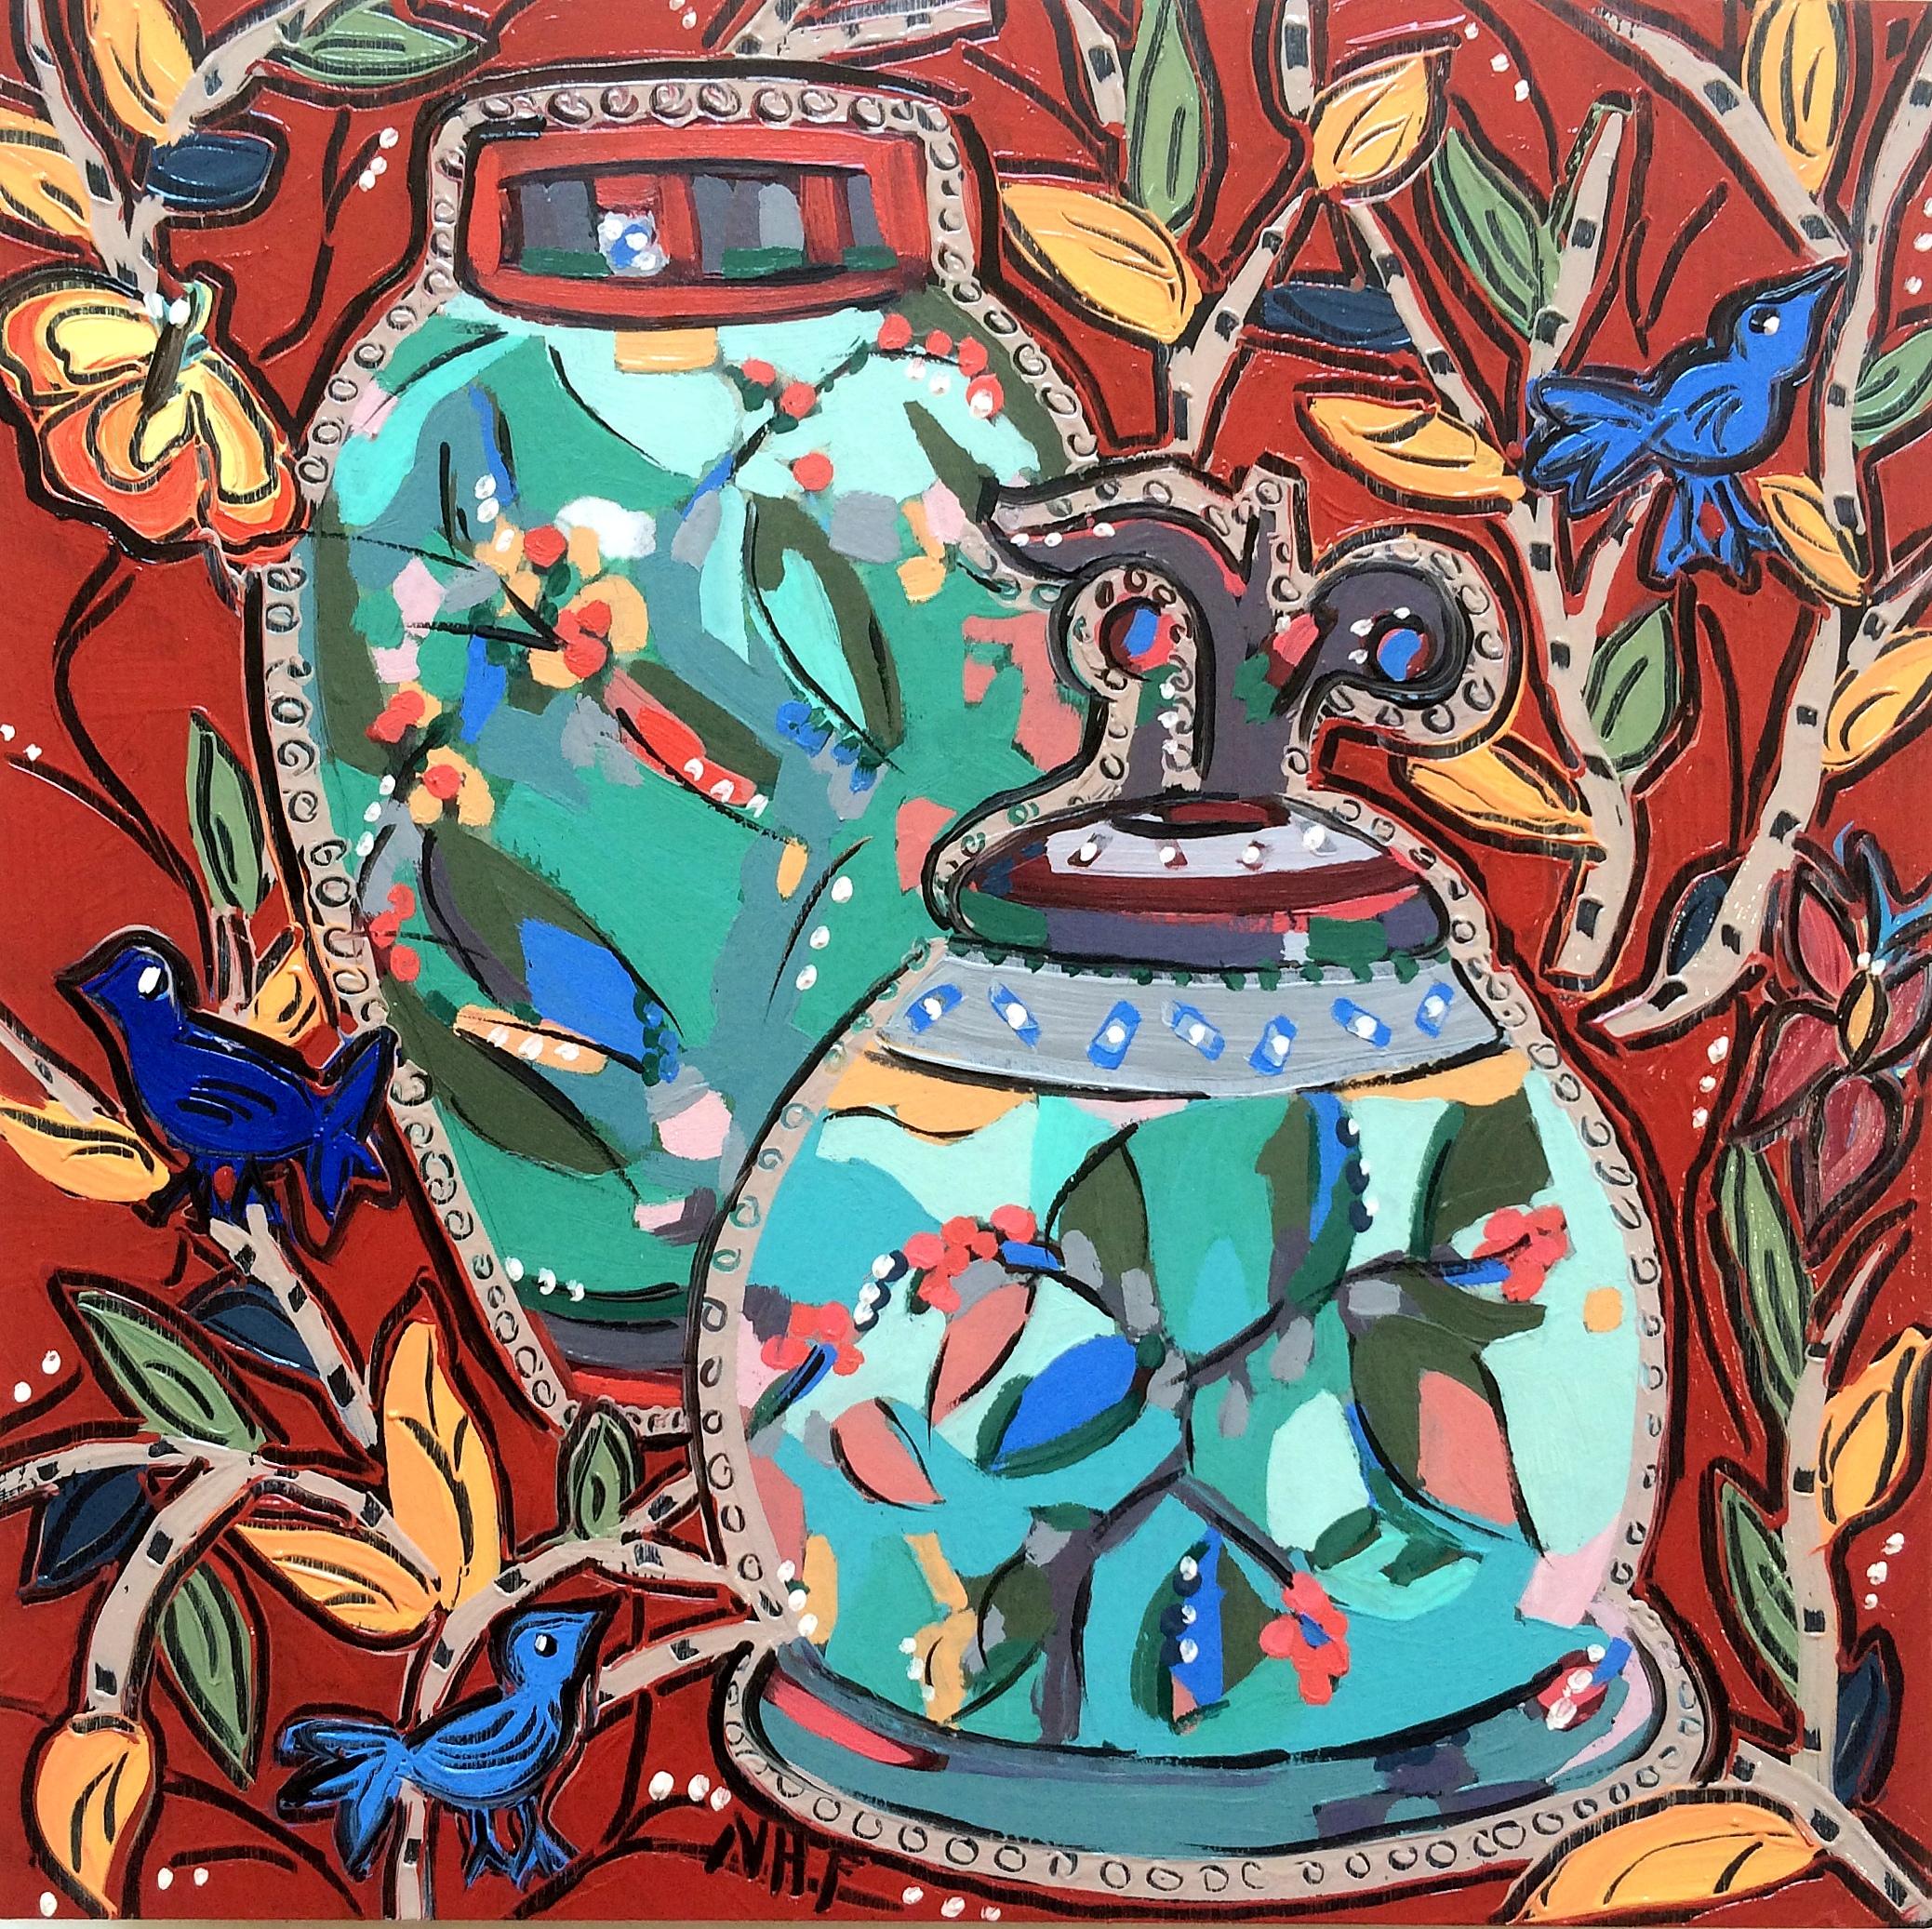 Vessels in Dreamtime 12, oil on panel, 8x8